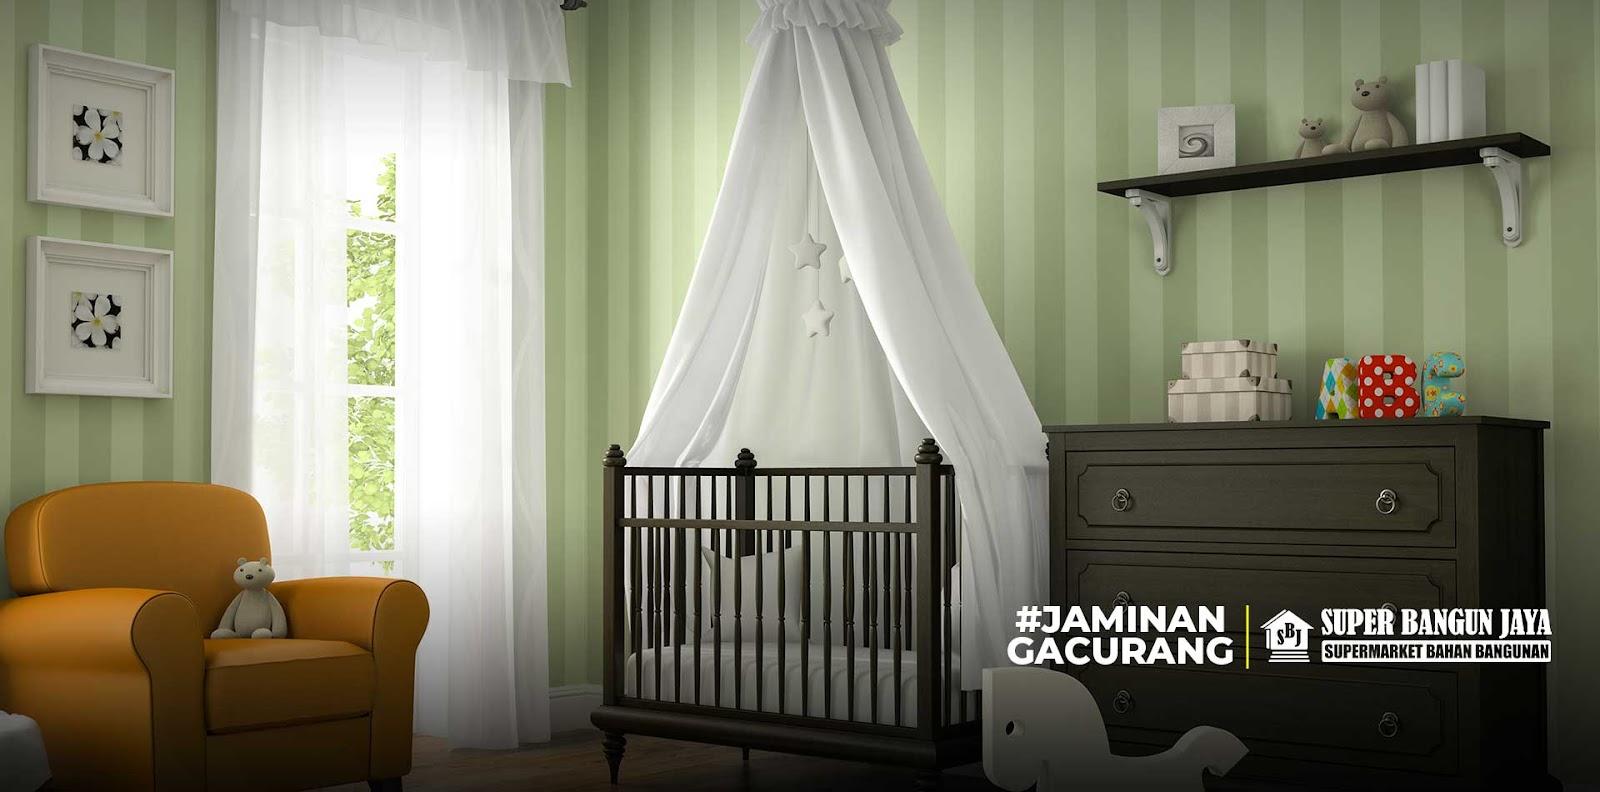 warna cat kamar tidur yang menenangkan - Super Bangun Jaya